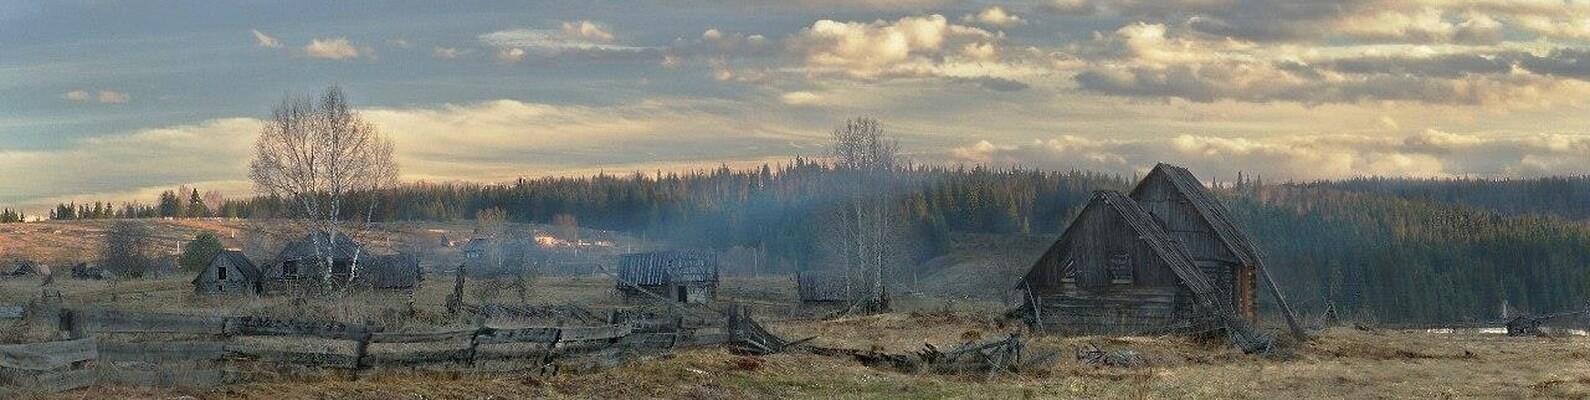 ДЕРЕВНЯ ПРИЗРАК: феномен Сибири